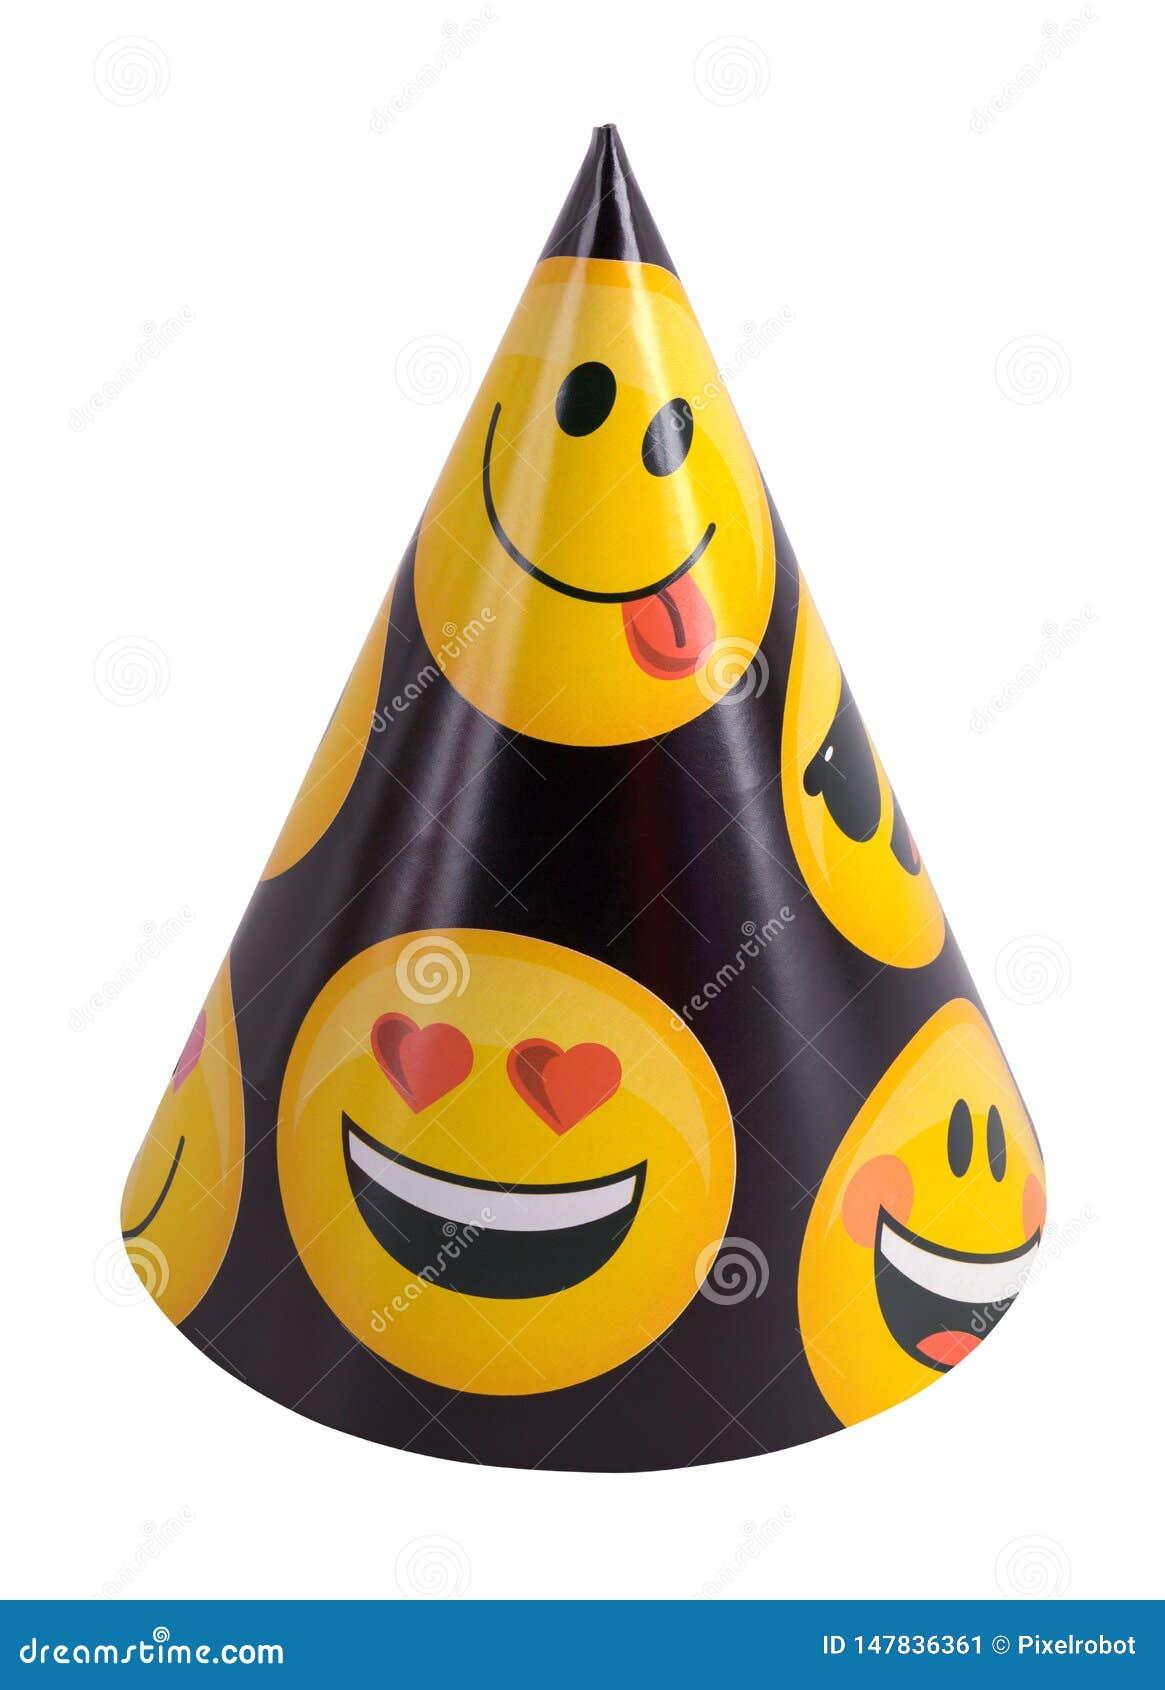 Emoji Party Hat stock image  Image of party, retro, cone